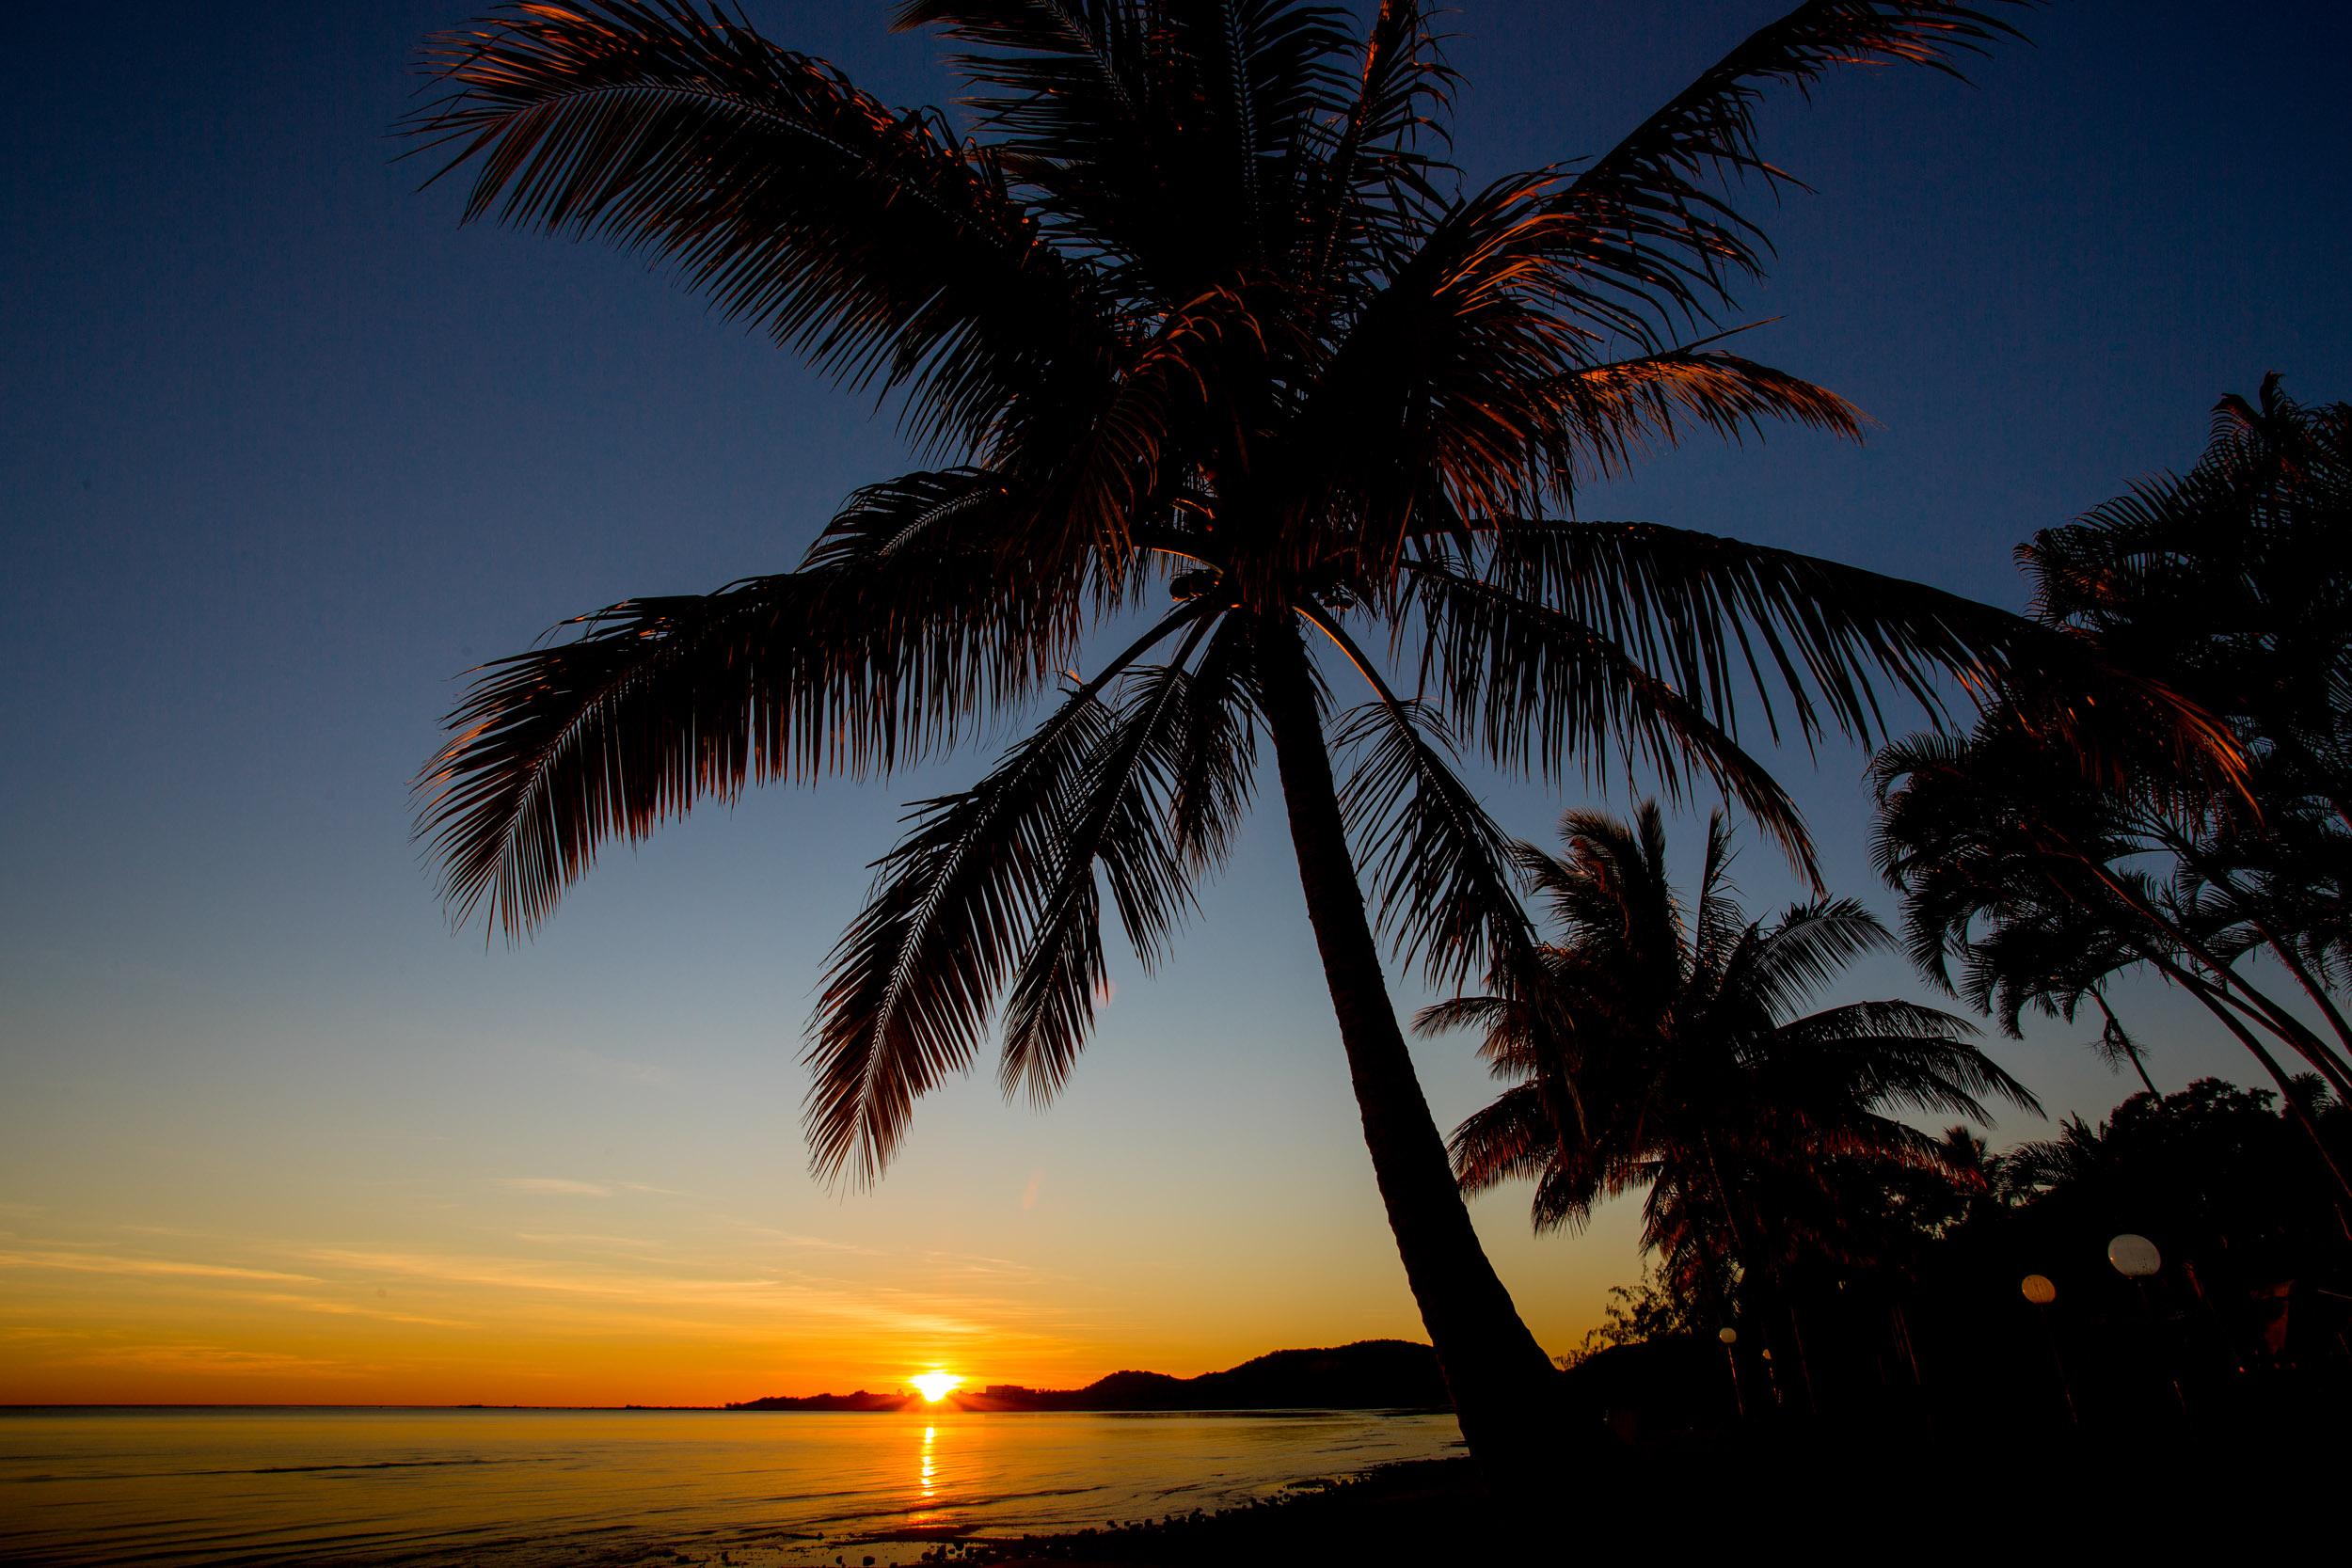 bowen-palm-trees-sunrise.jpg